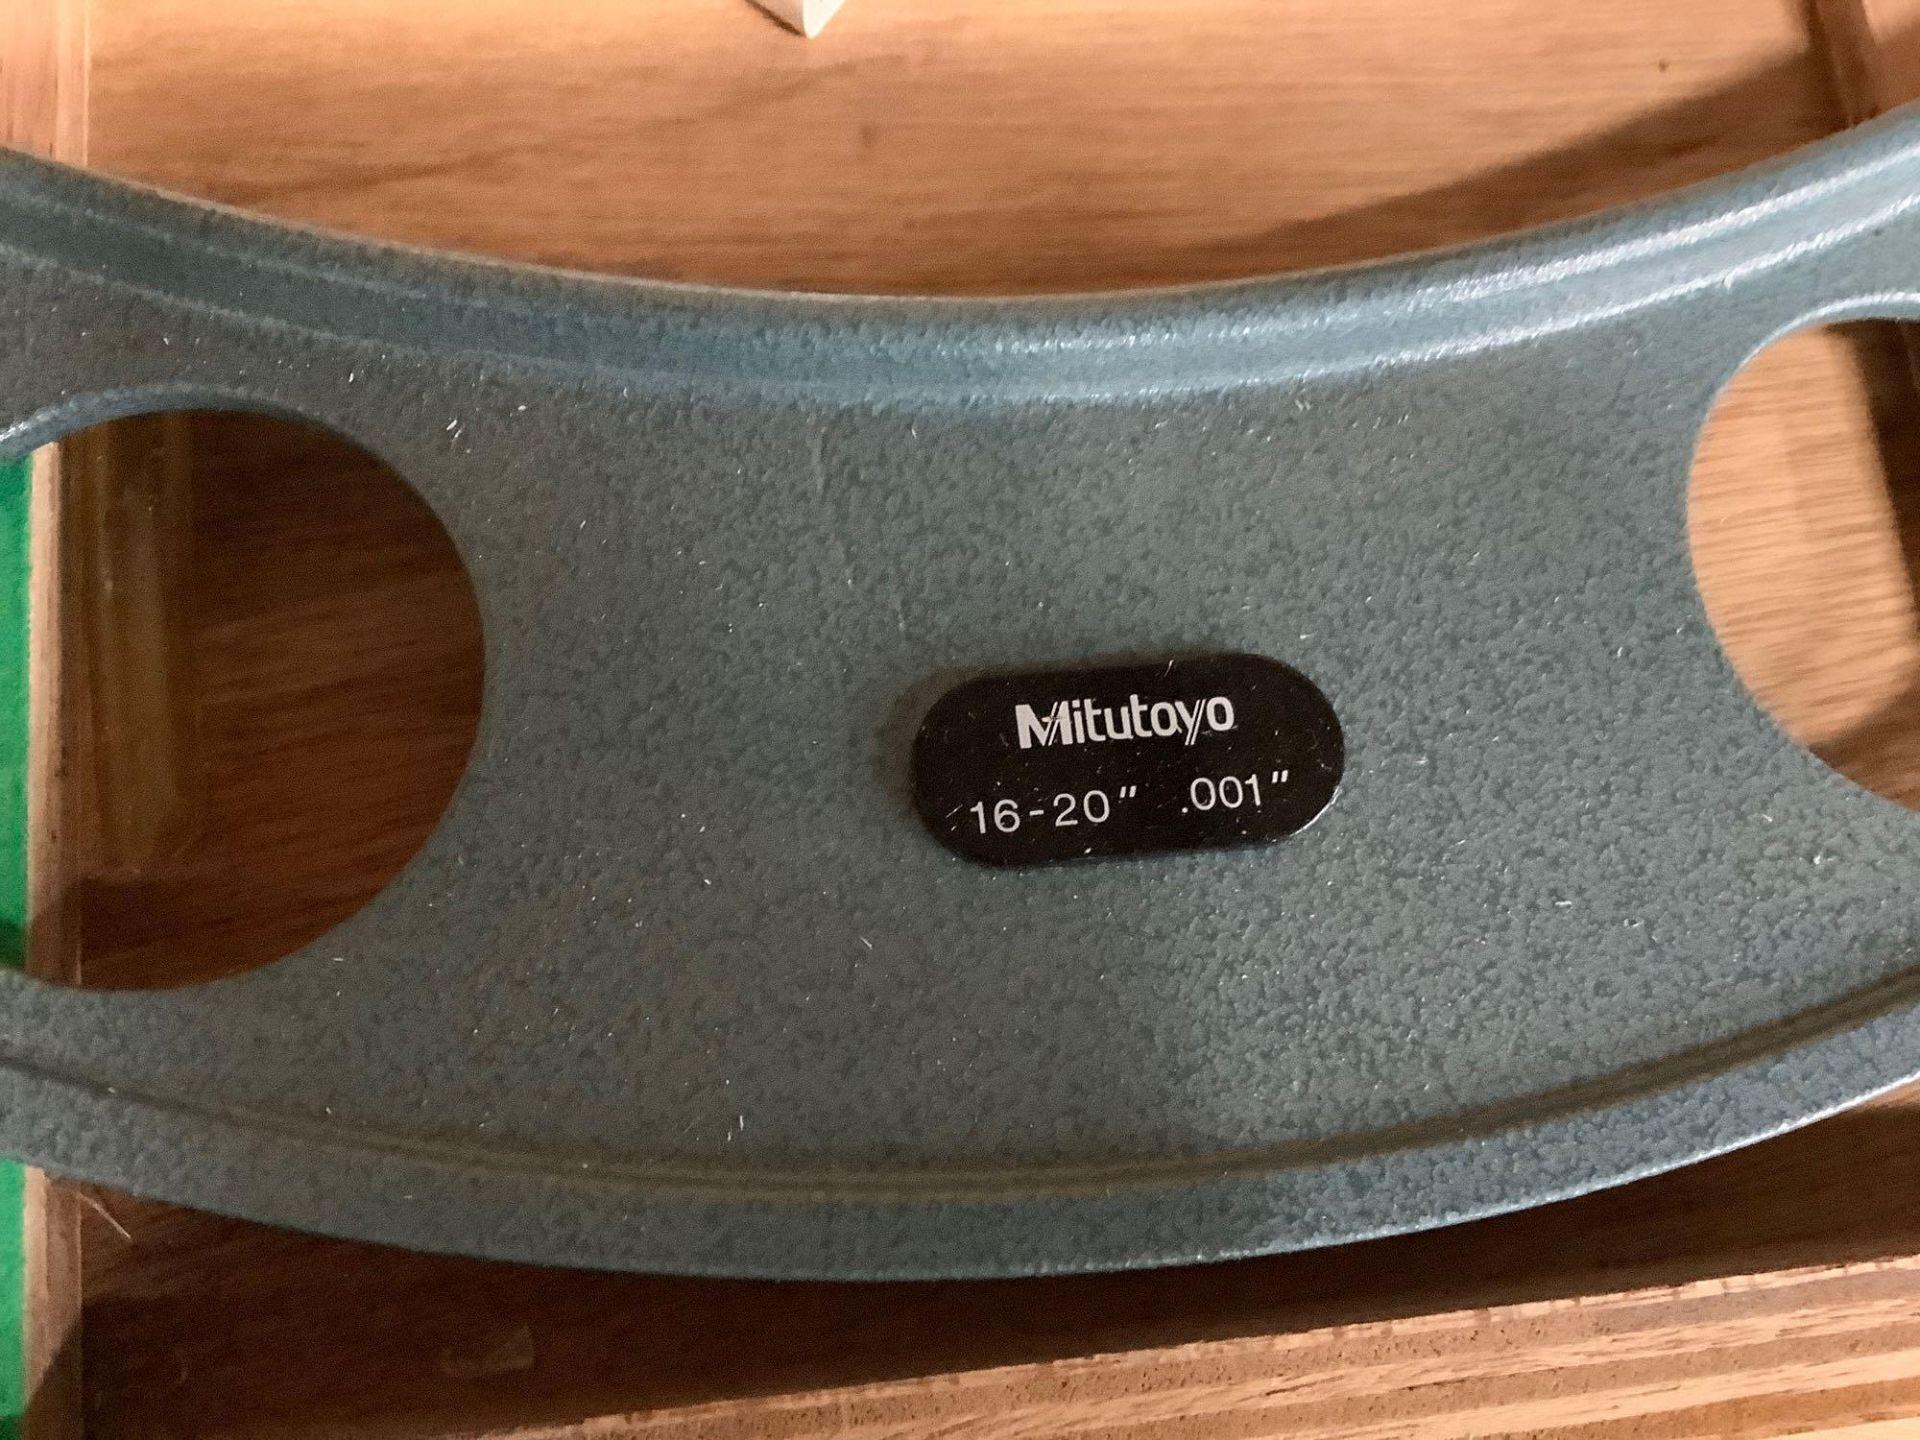 "Mitutoyo OD Micrometer 16-20"" - Image 2 of 4"